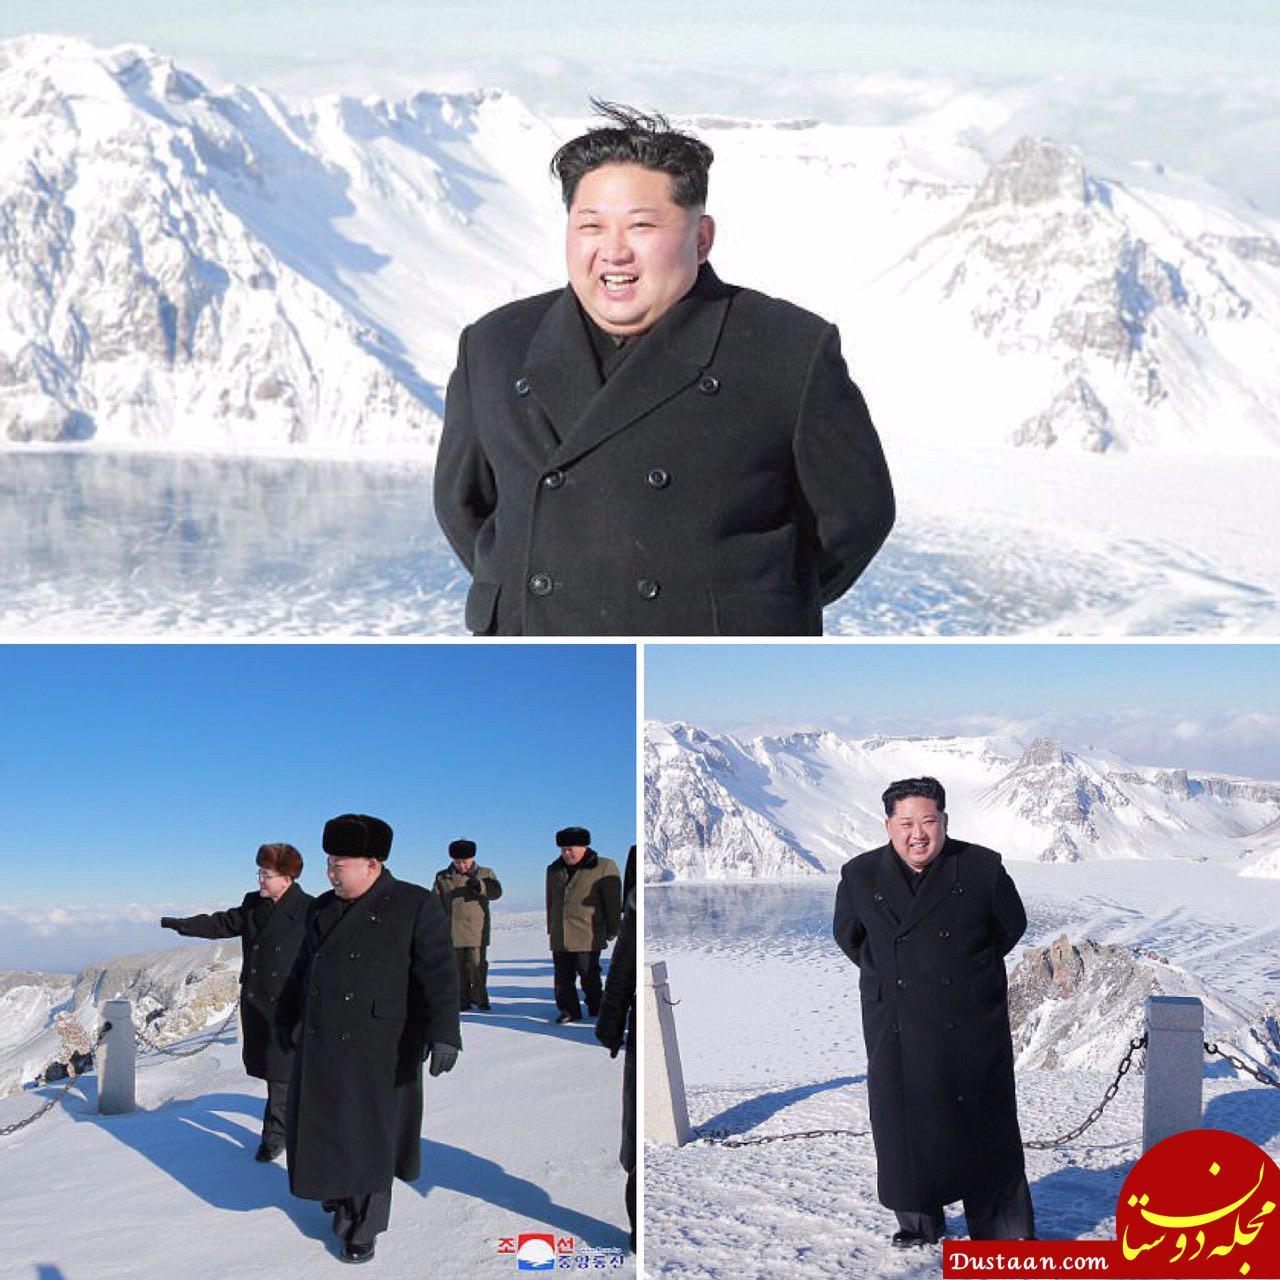 چهره خندان کیم جونگ اون در حال کوه نوردی! +تصاویر